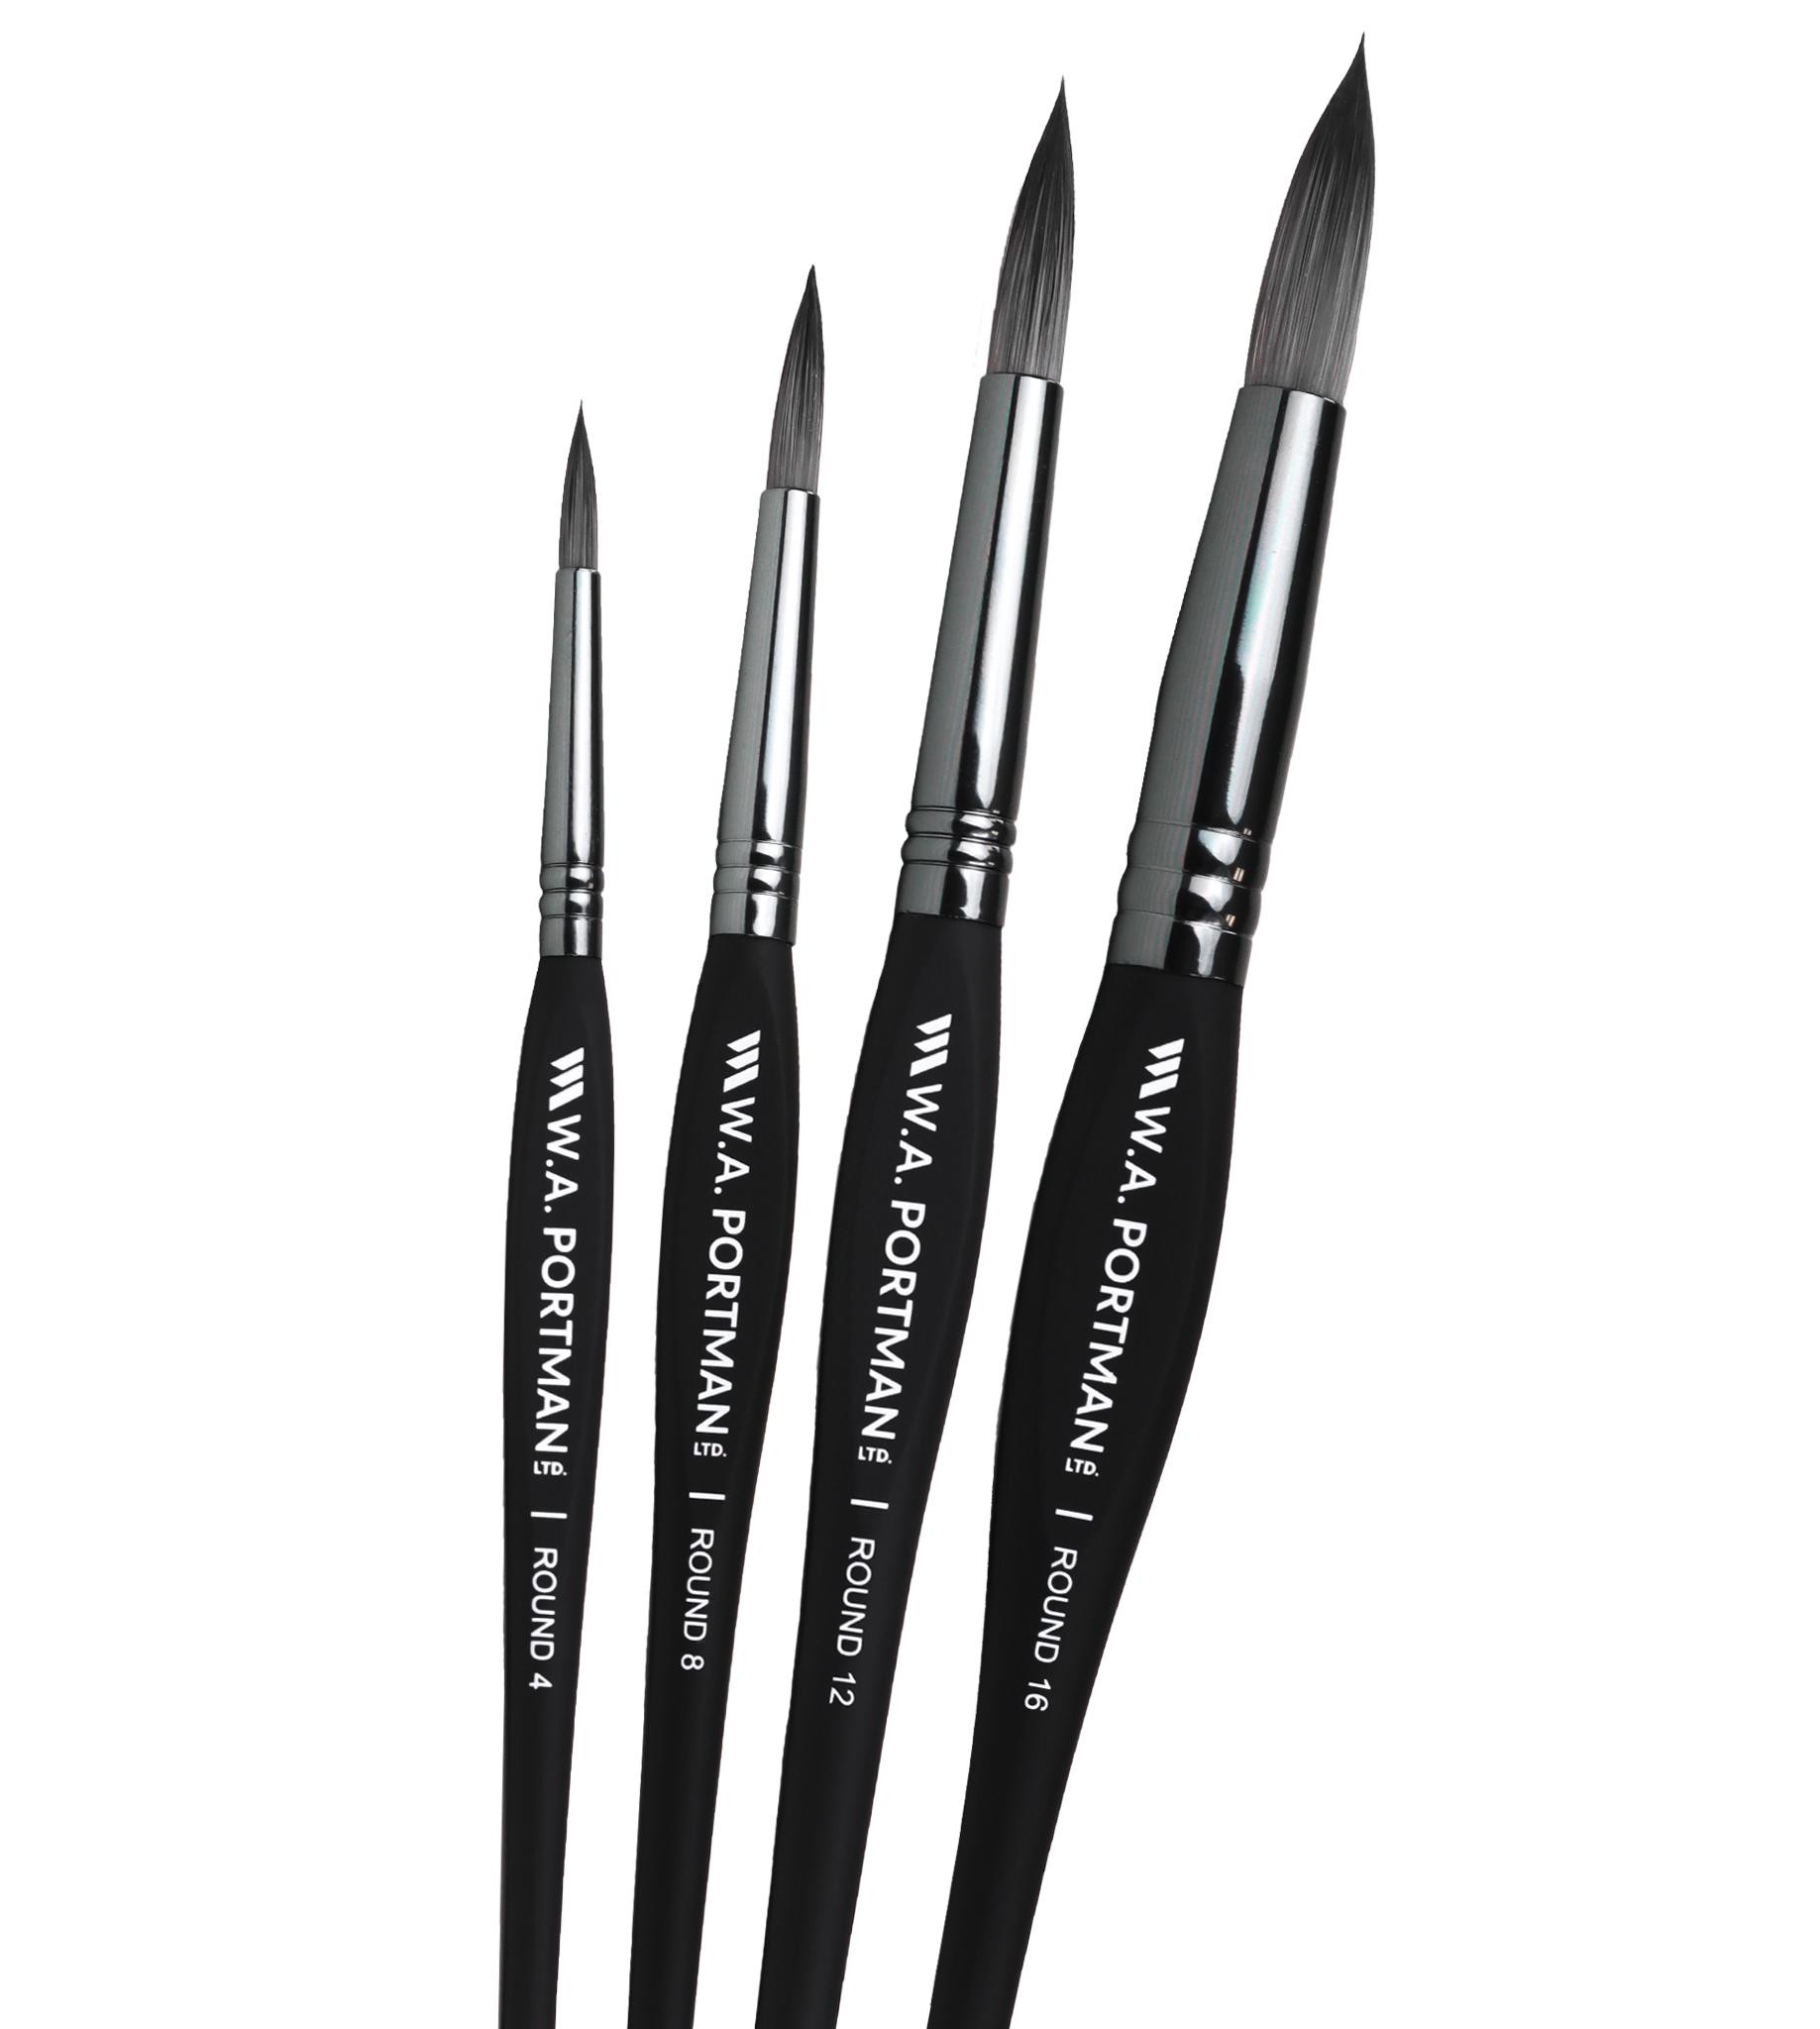 W.A. Portman Round Brushes 4pc